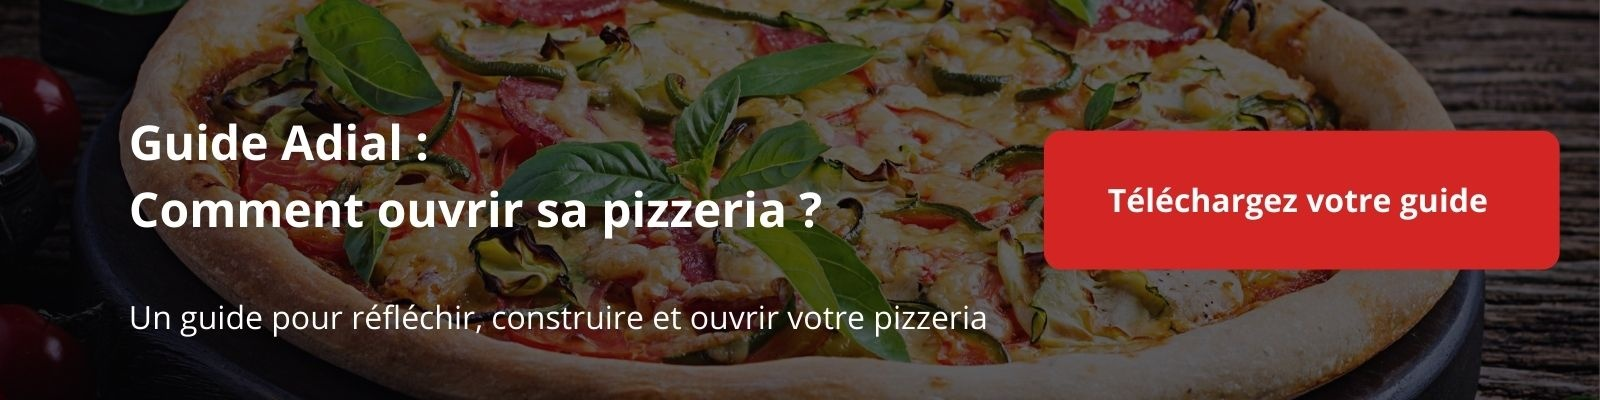 ouvrir sa pizzeria